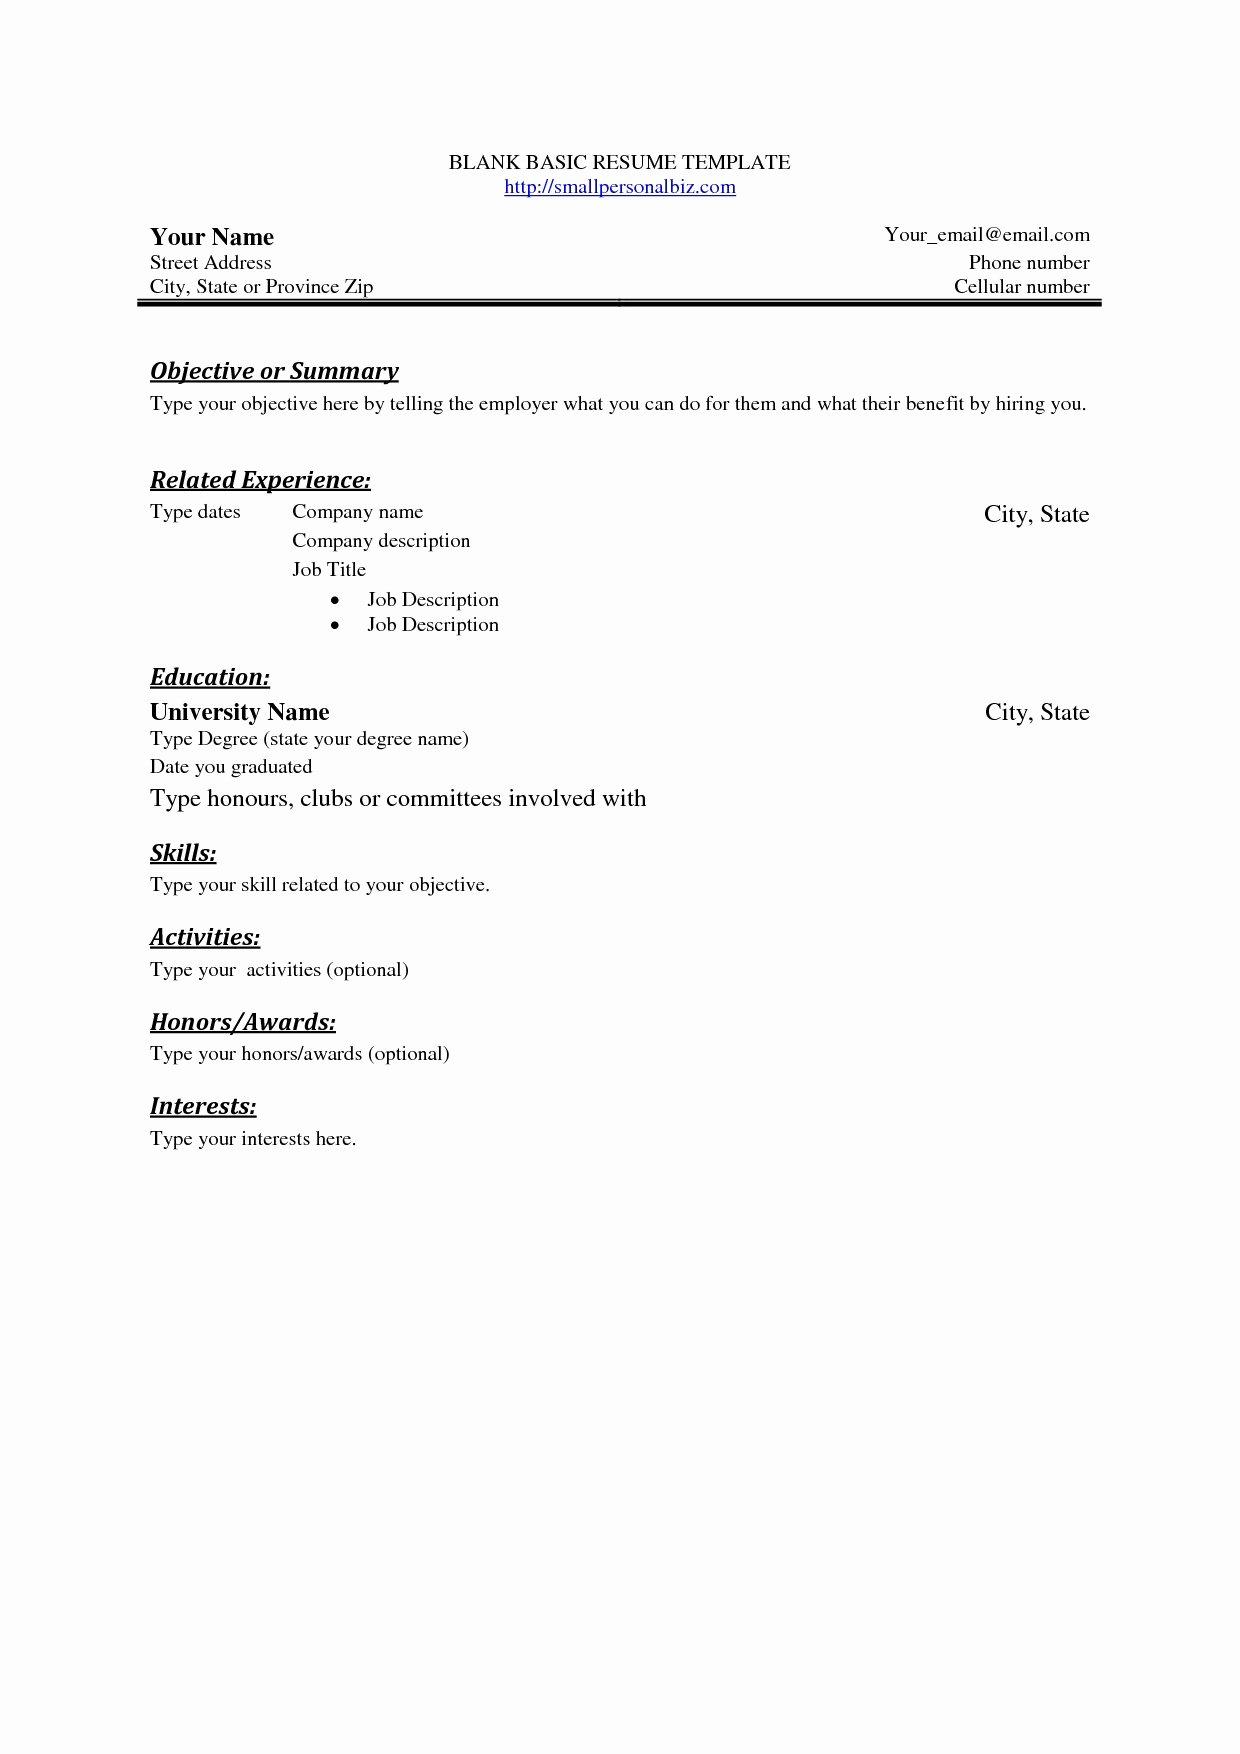 Blank Basic Resume Template